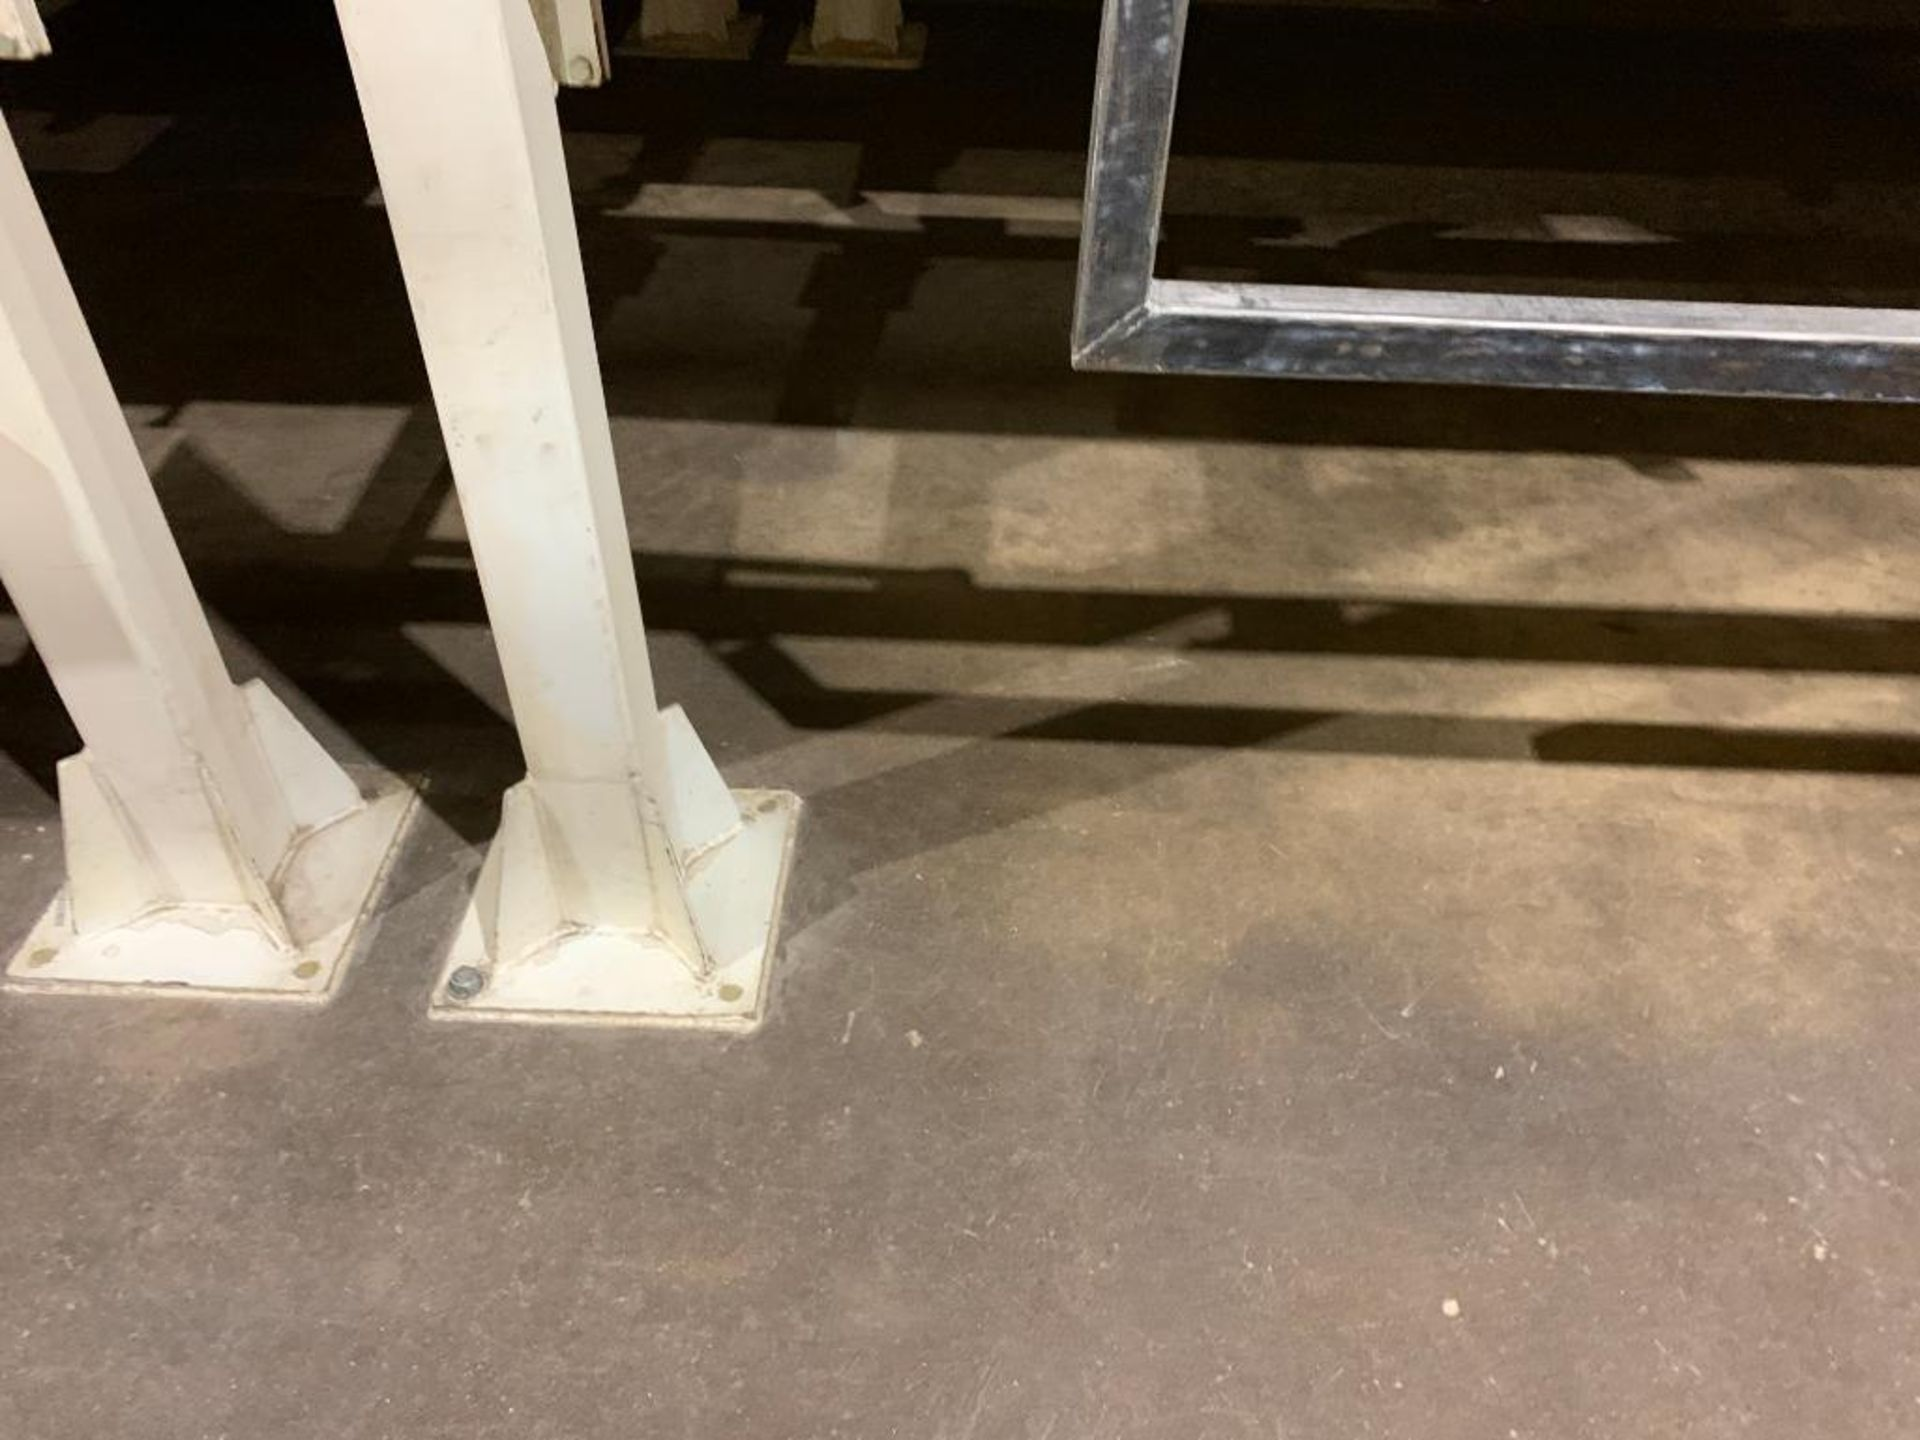 Aseeco mild steel cone bottom bulk storage bin - Image 7 of 25